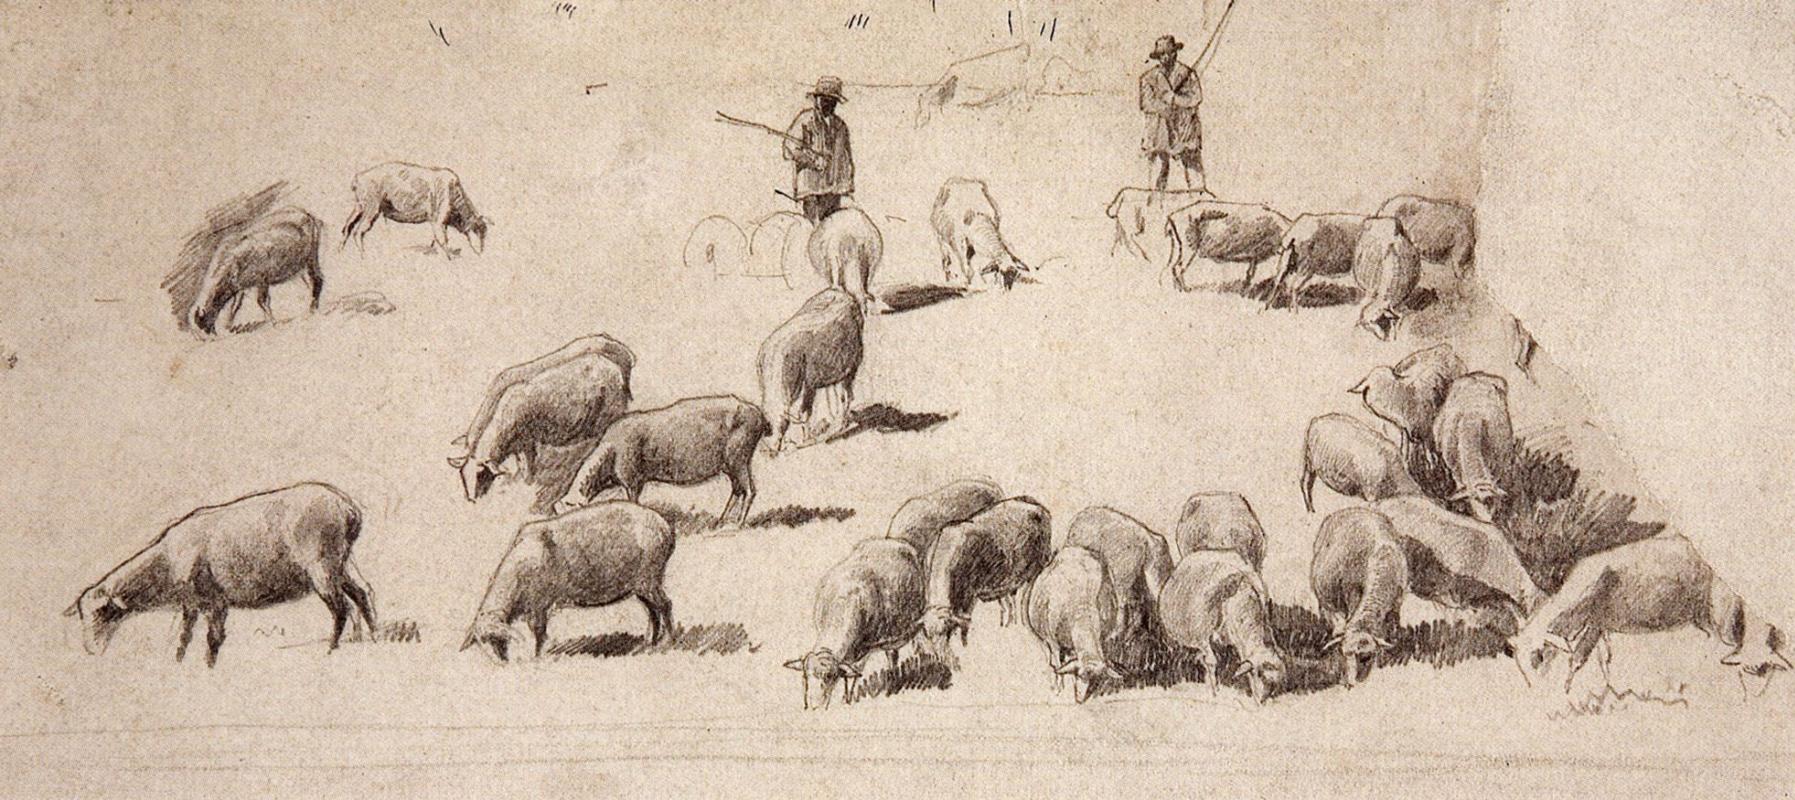 Ivan Shishkin. A flock of sheep